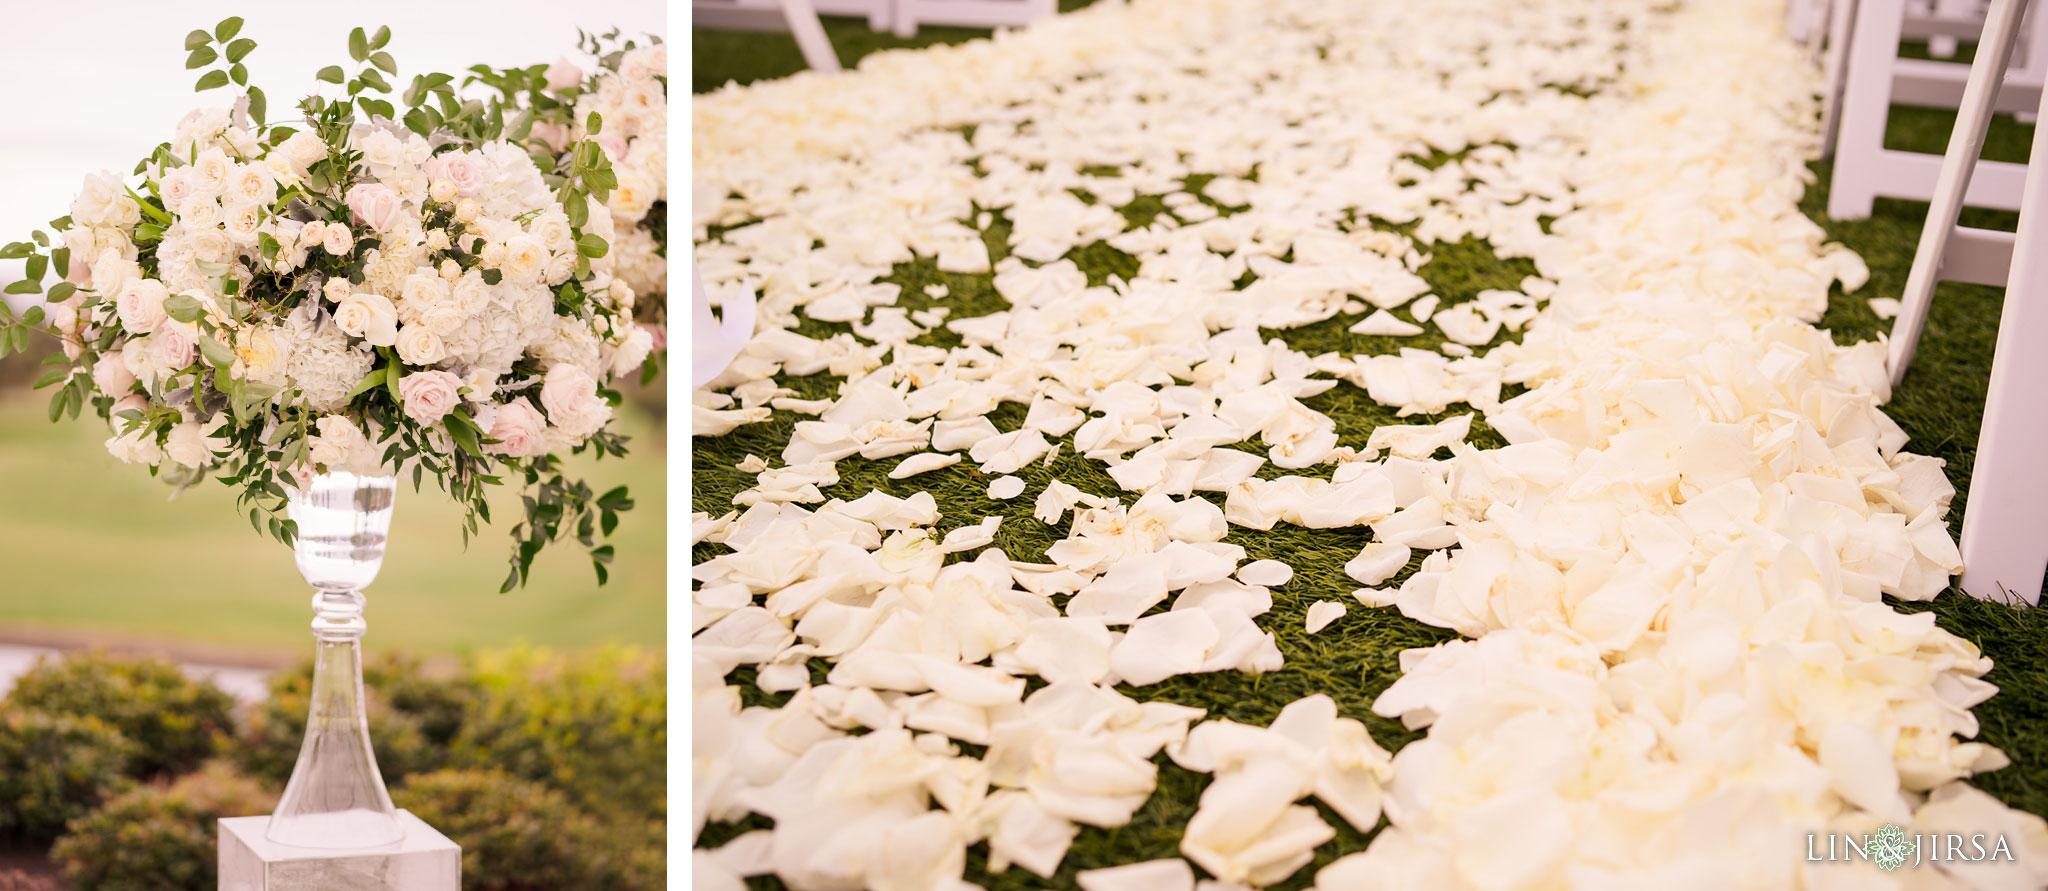 15 monarch beach resort laguna niguel persian wedding photography